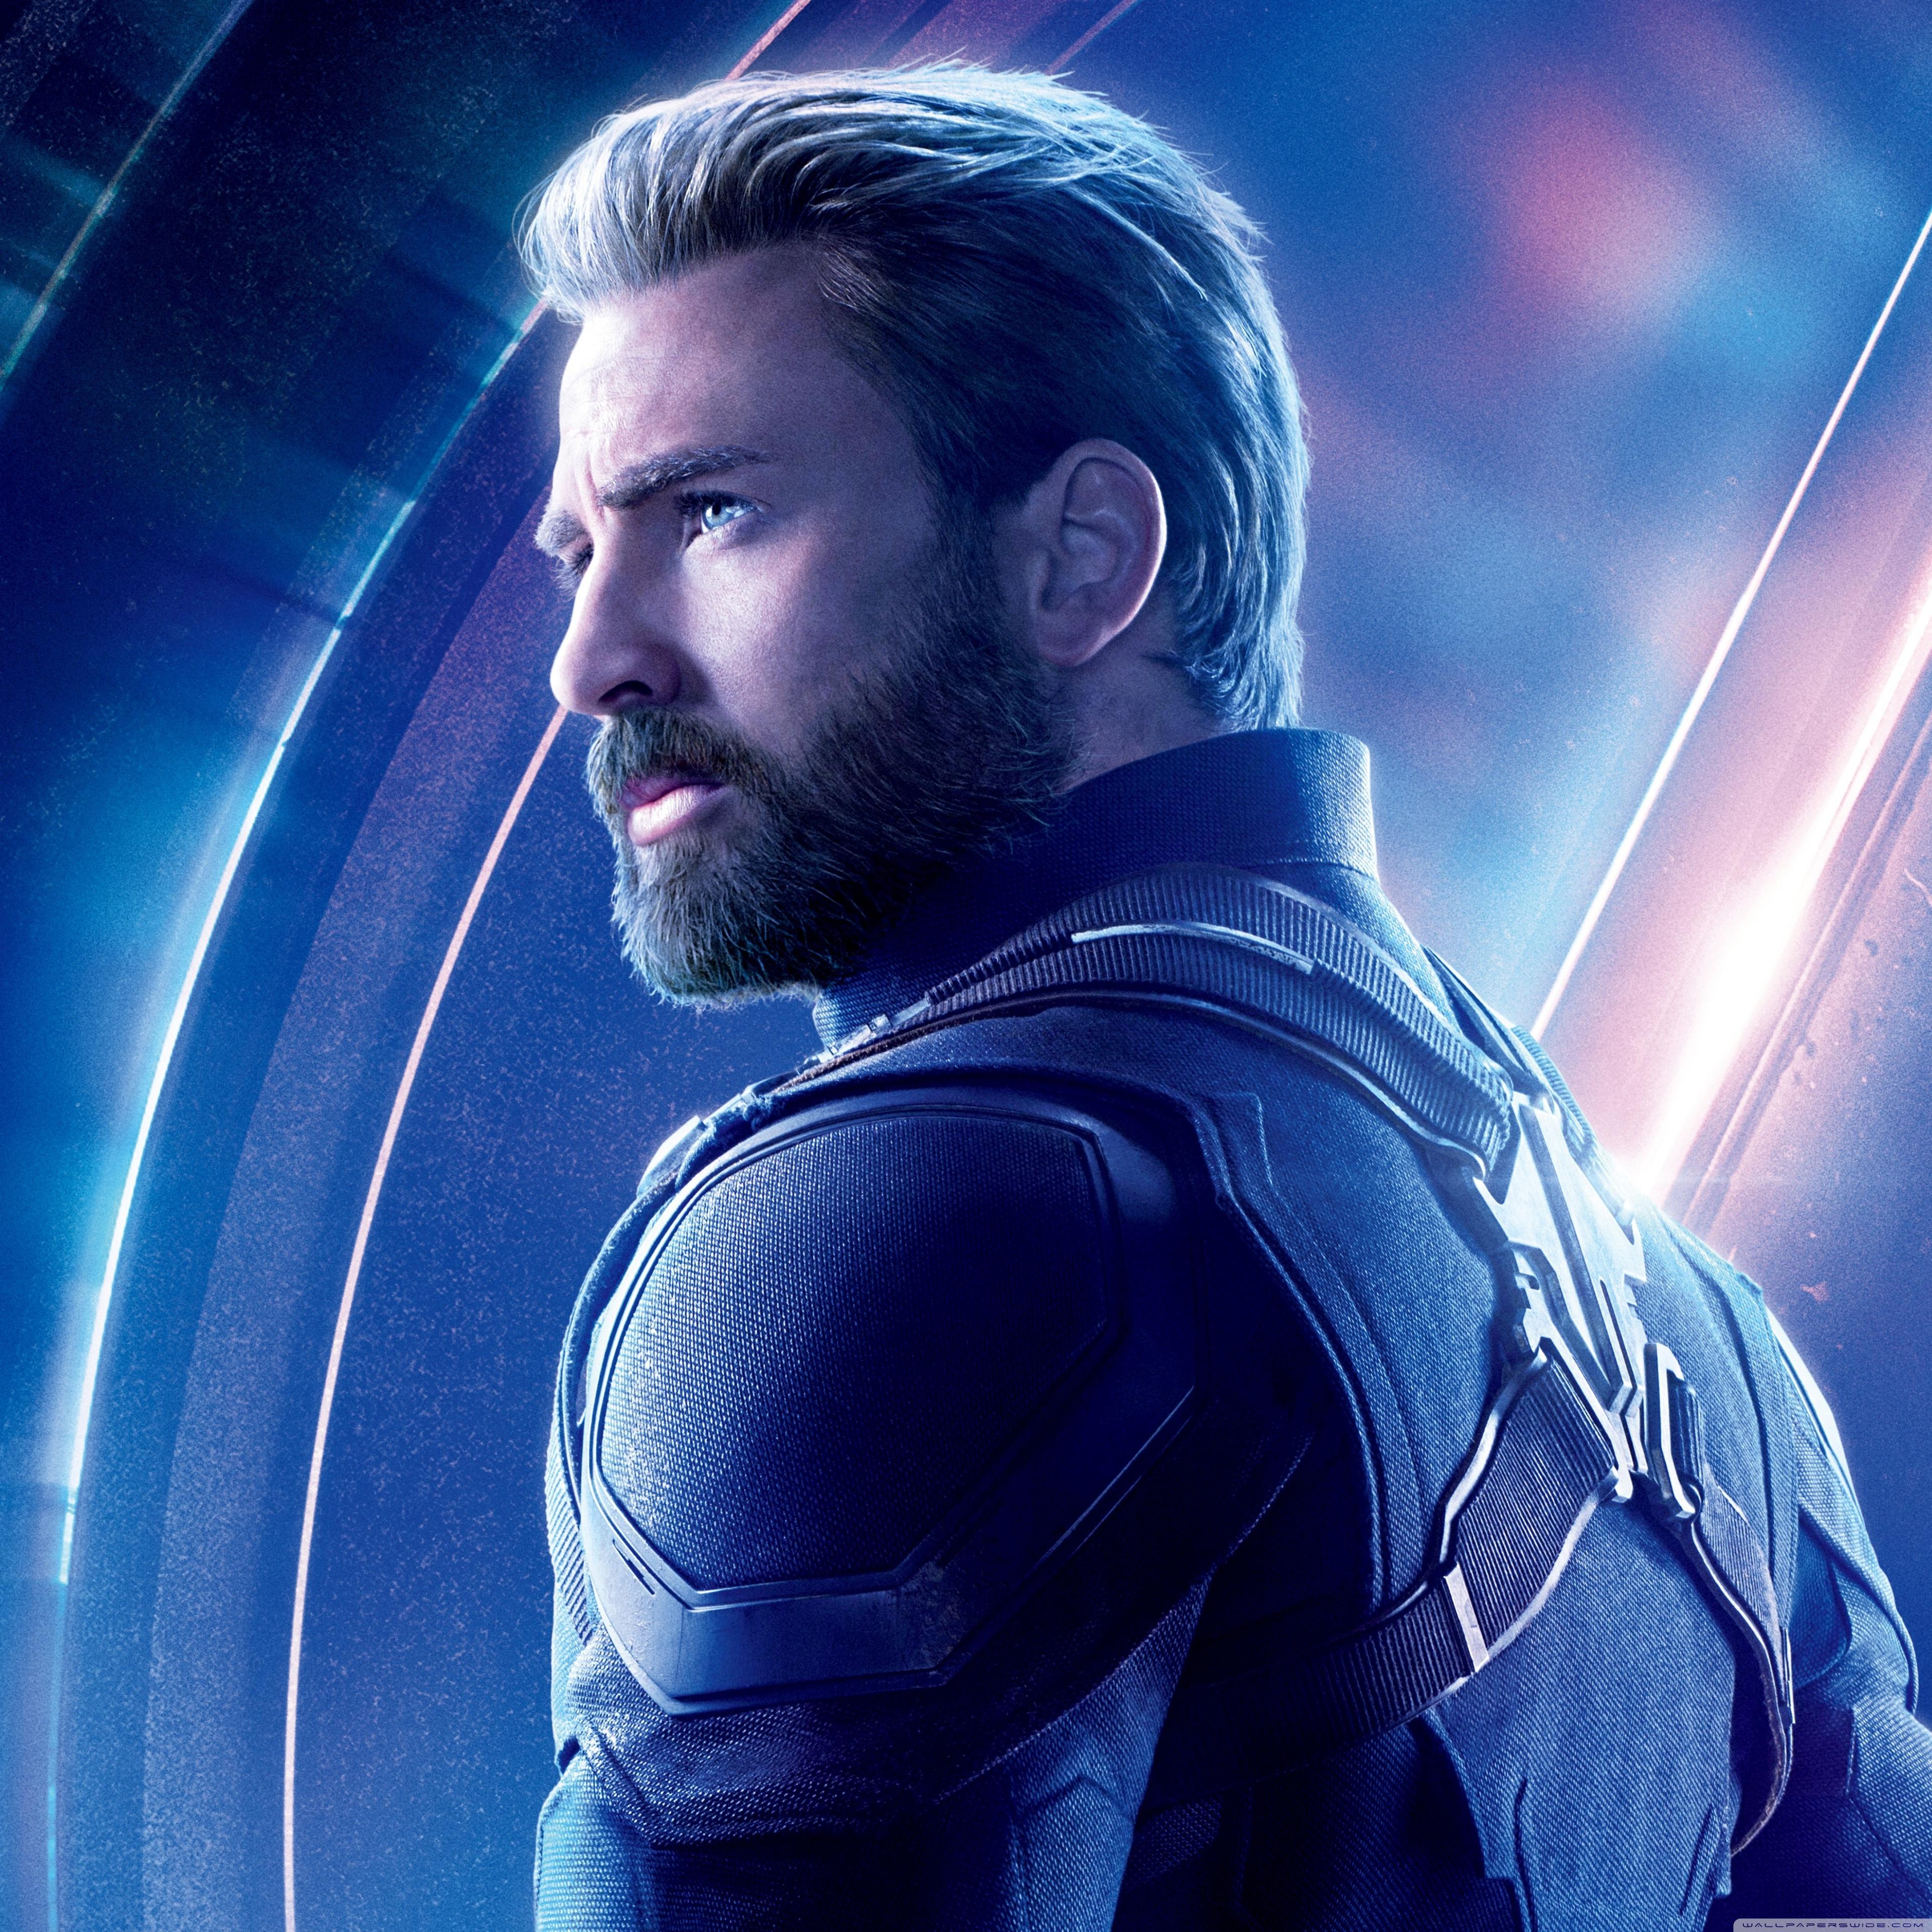 Avengers Infinity War 2018 Movie Captain America 4K HD Desktop 3840x3840